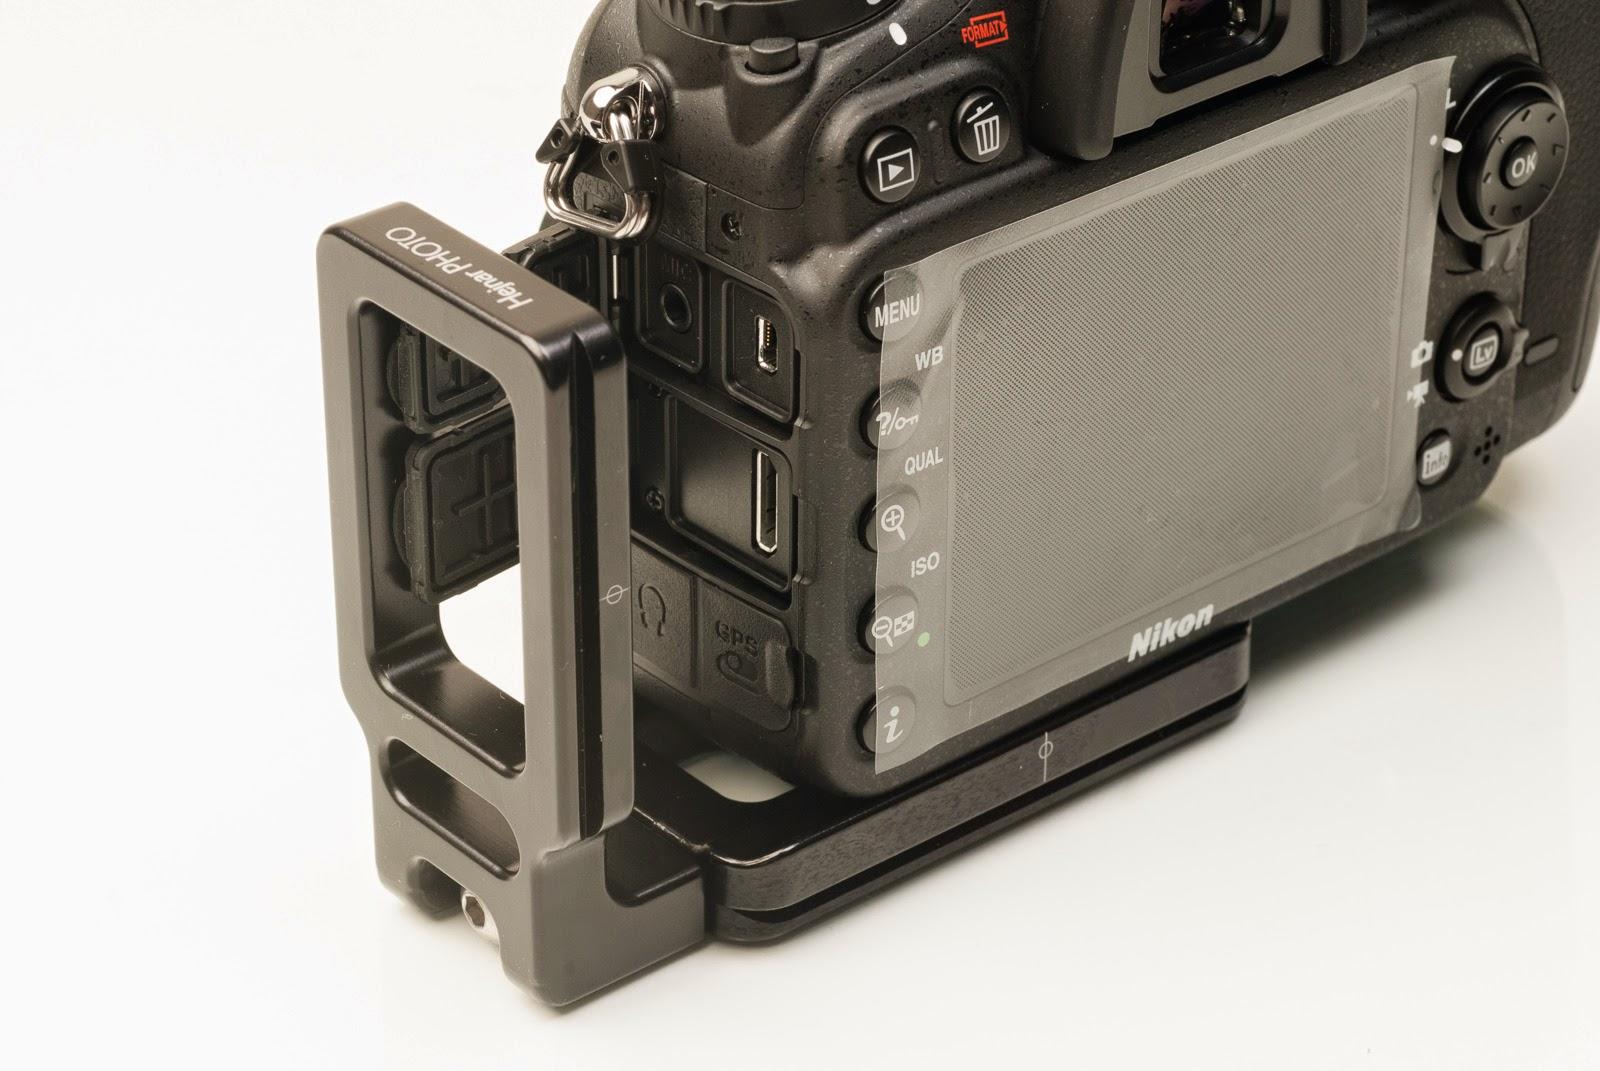 Nikon D7100 w/ ND-7100 L bracket - side out